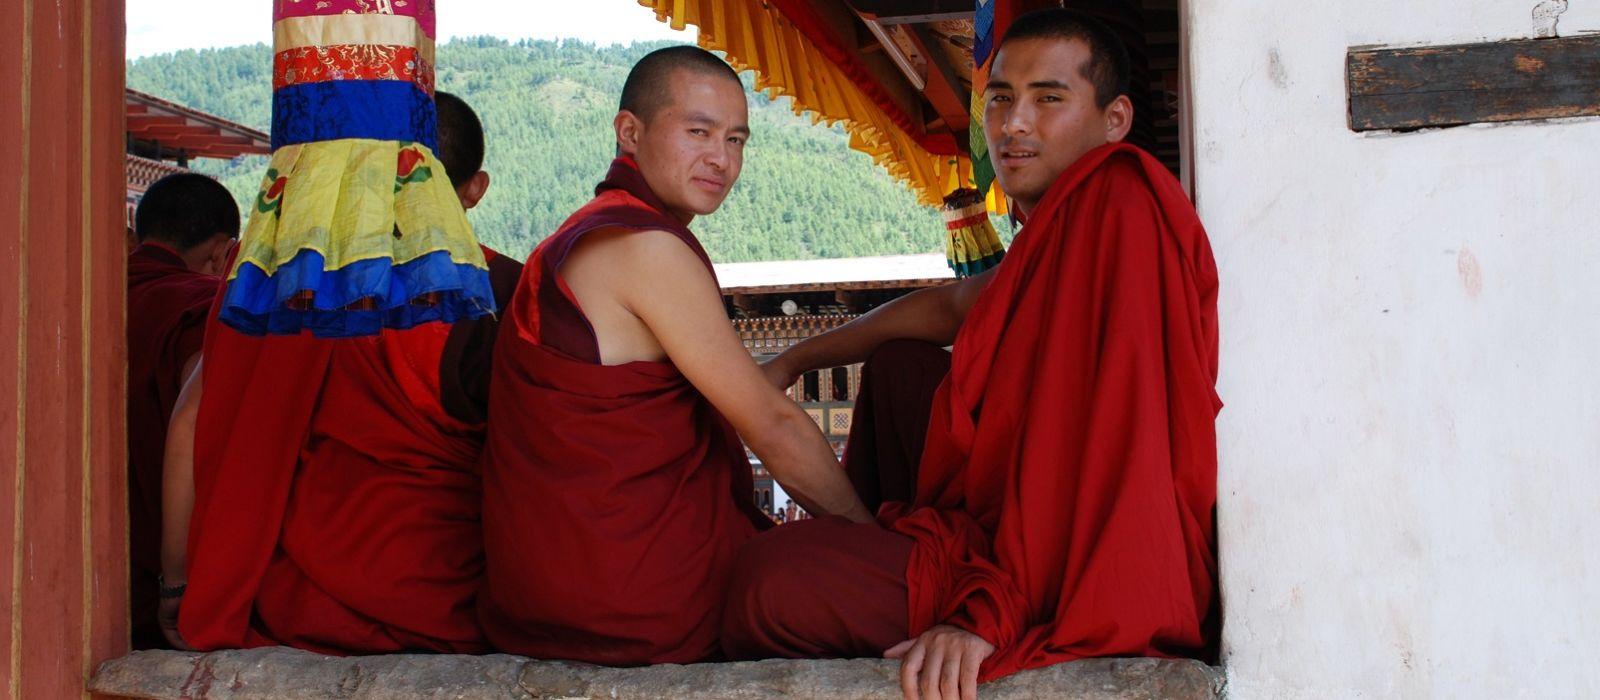 Exklusive Bhutan Luxusreise Urlaub 3